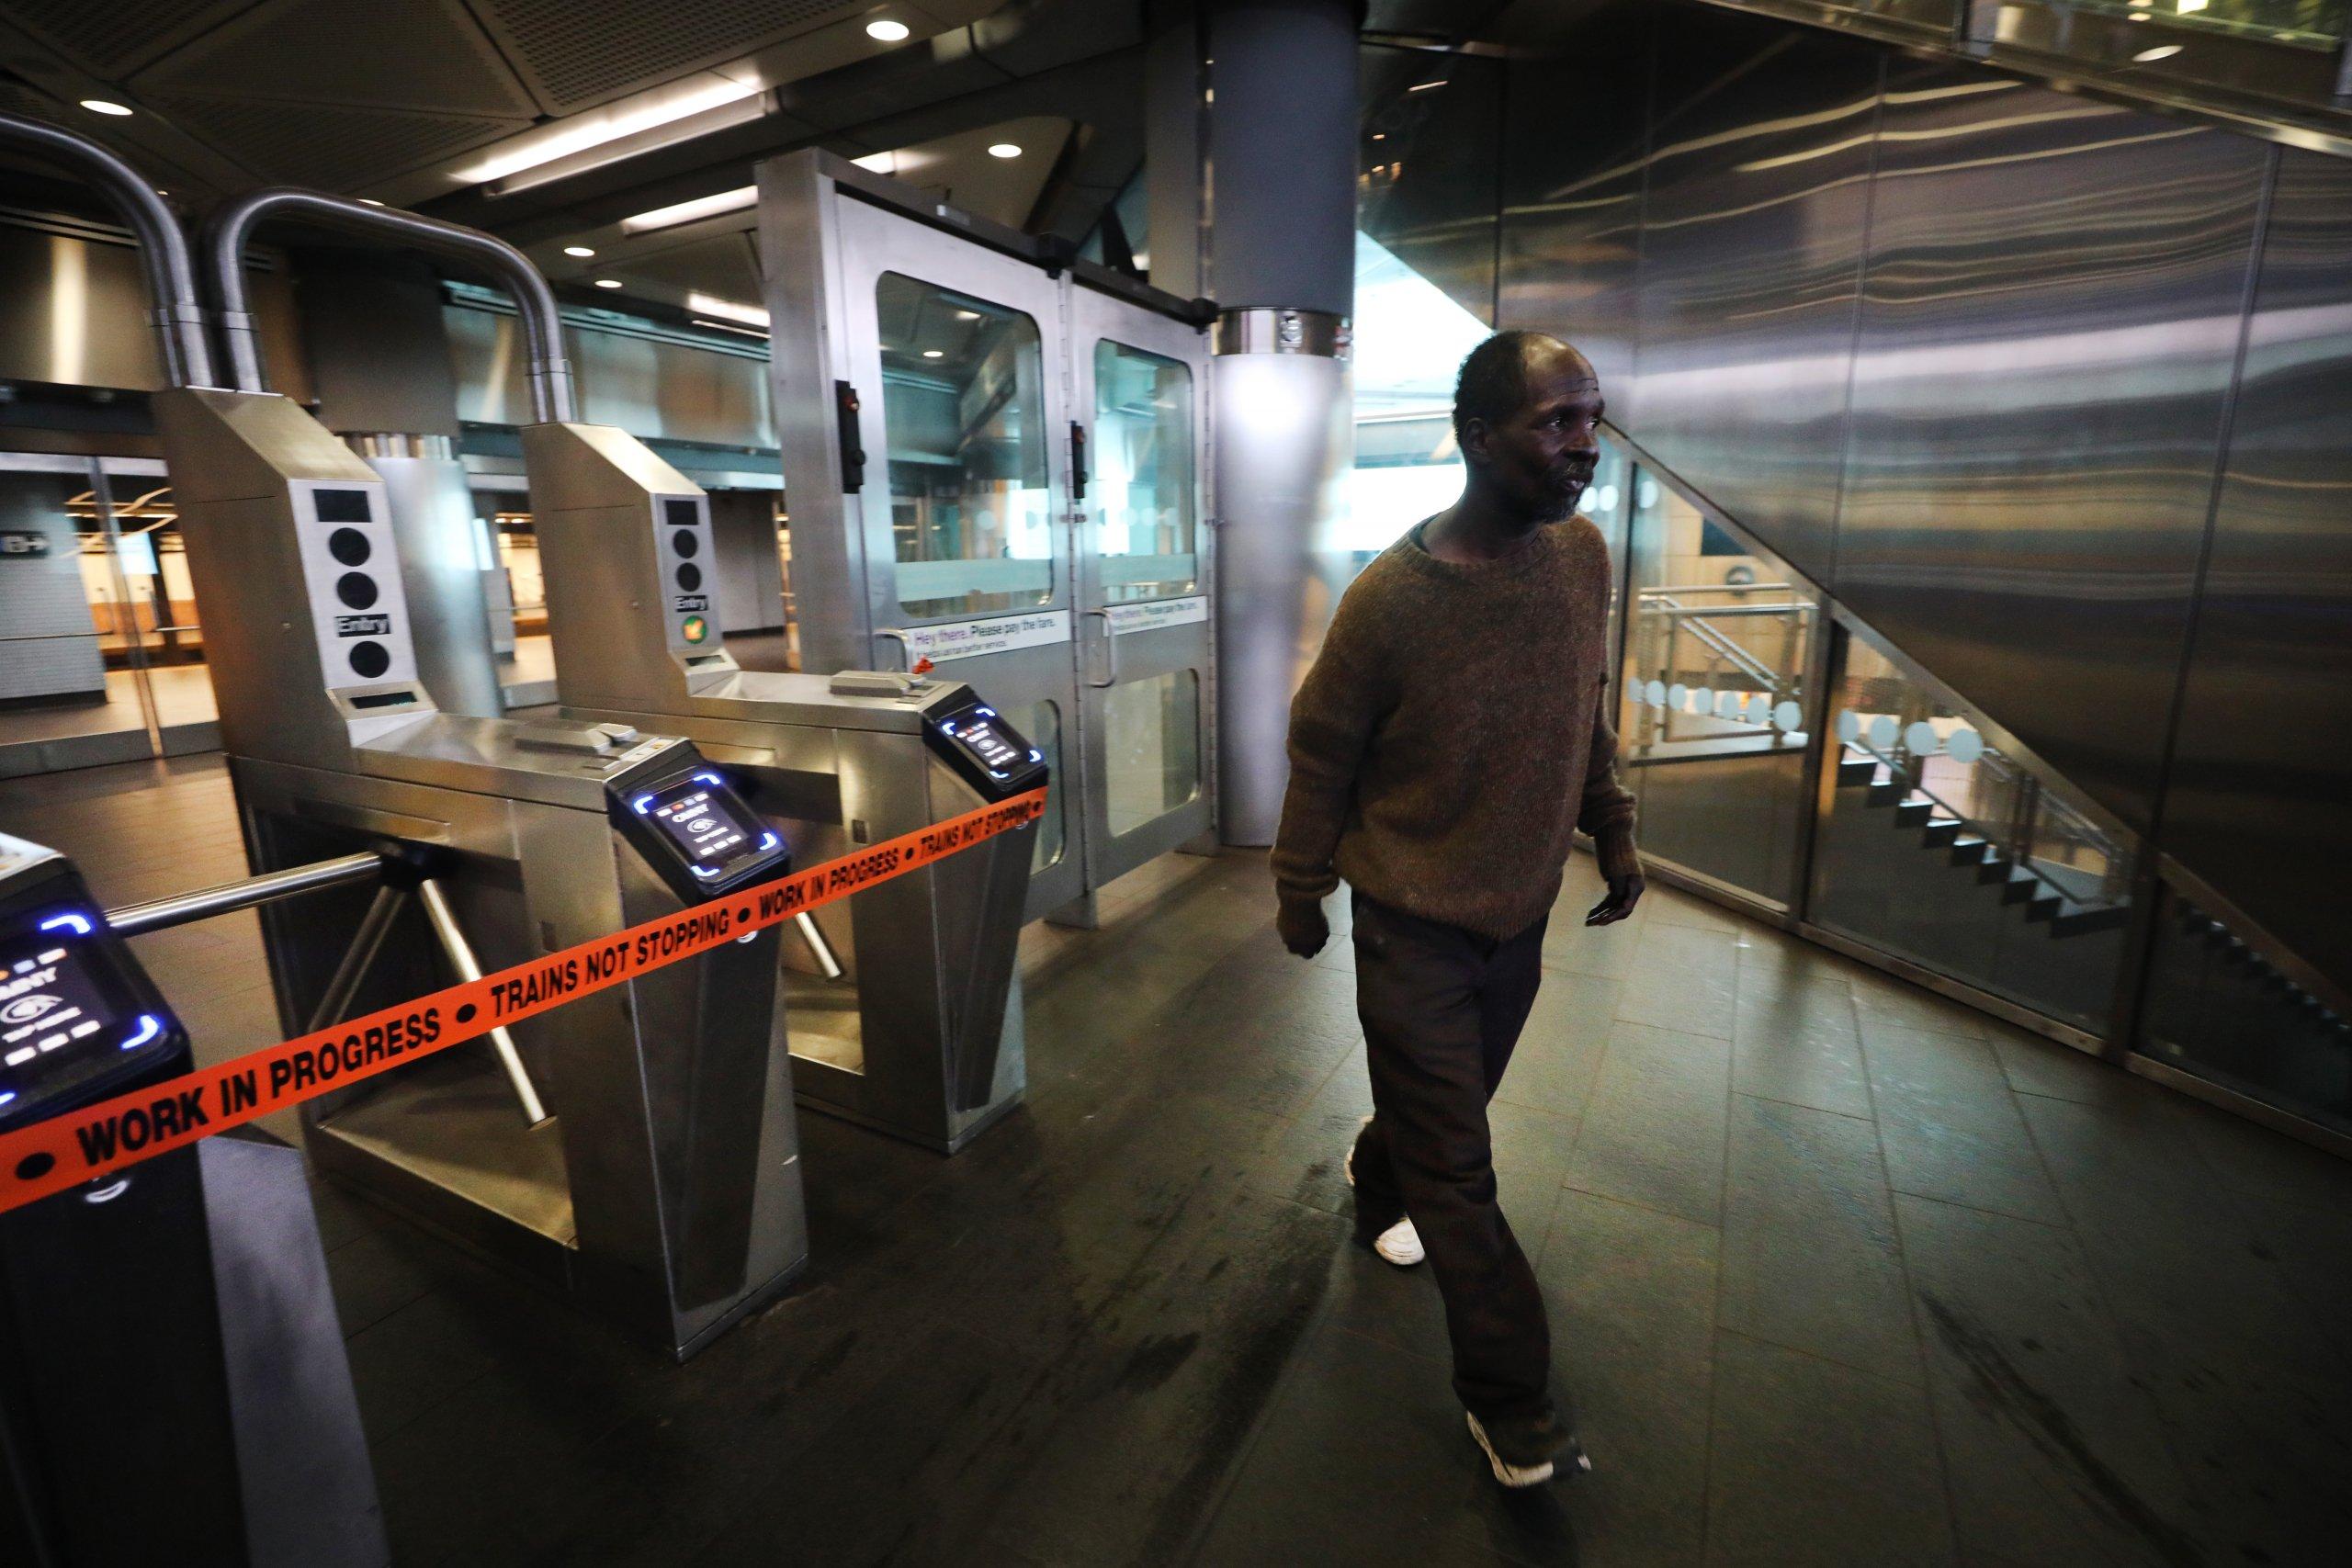 New York City's Subway System To Shut Down Overnight For Cleaning During Coronavirus Pandemic